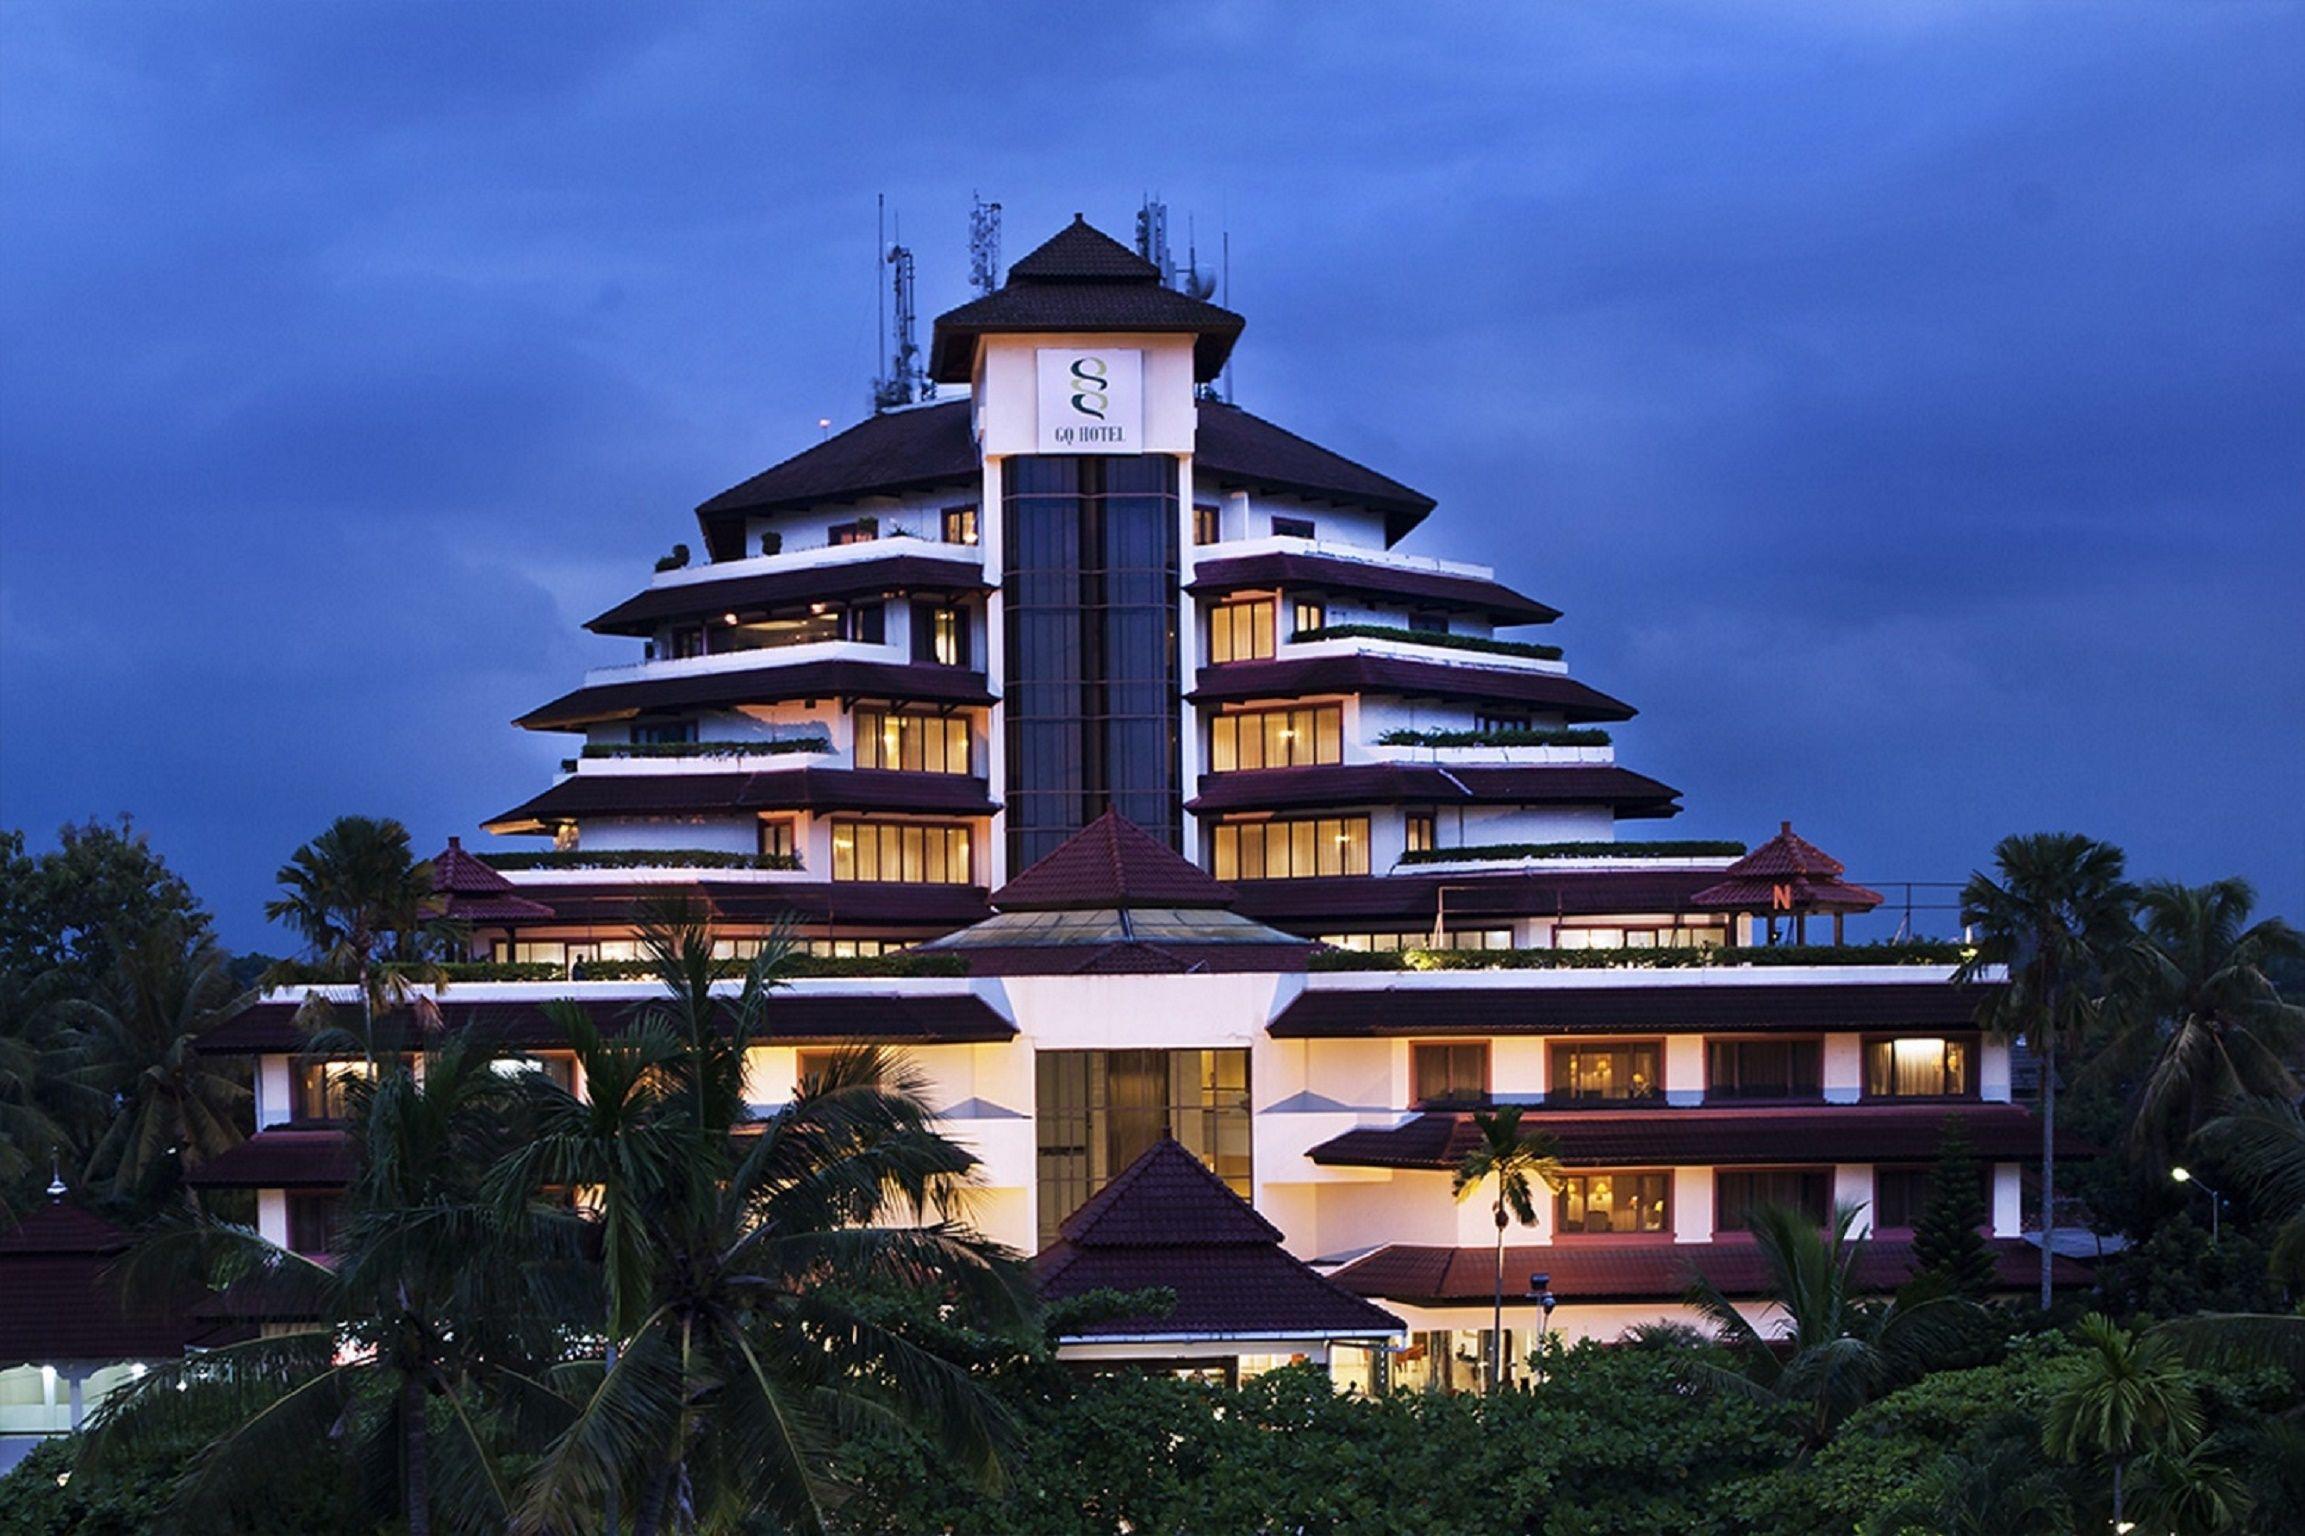 GQ Hotel Yogyakarta (Grand Quality Hotel), Sleman